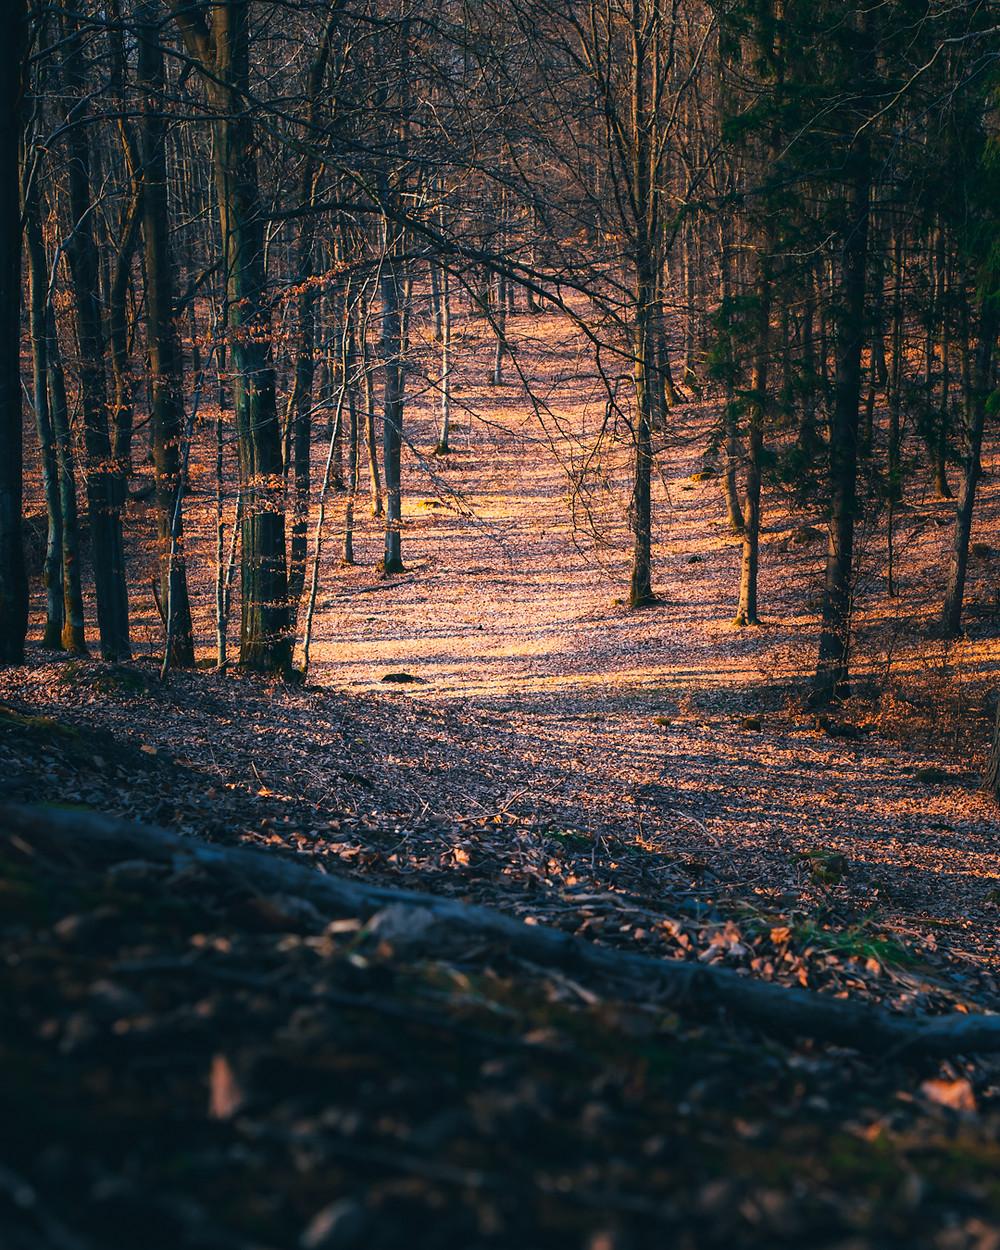 ciekawy las